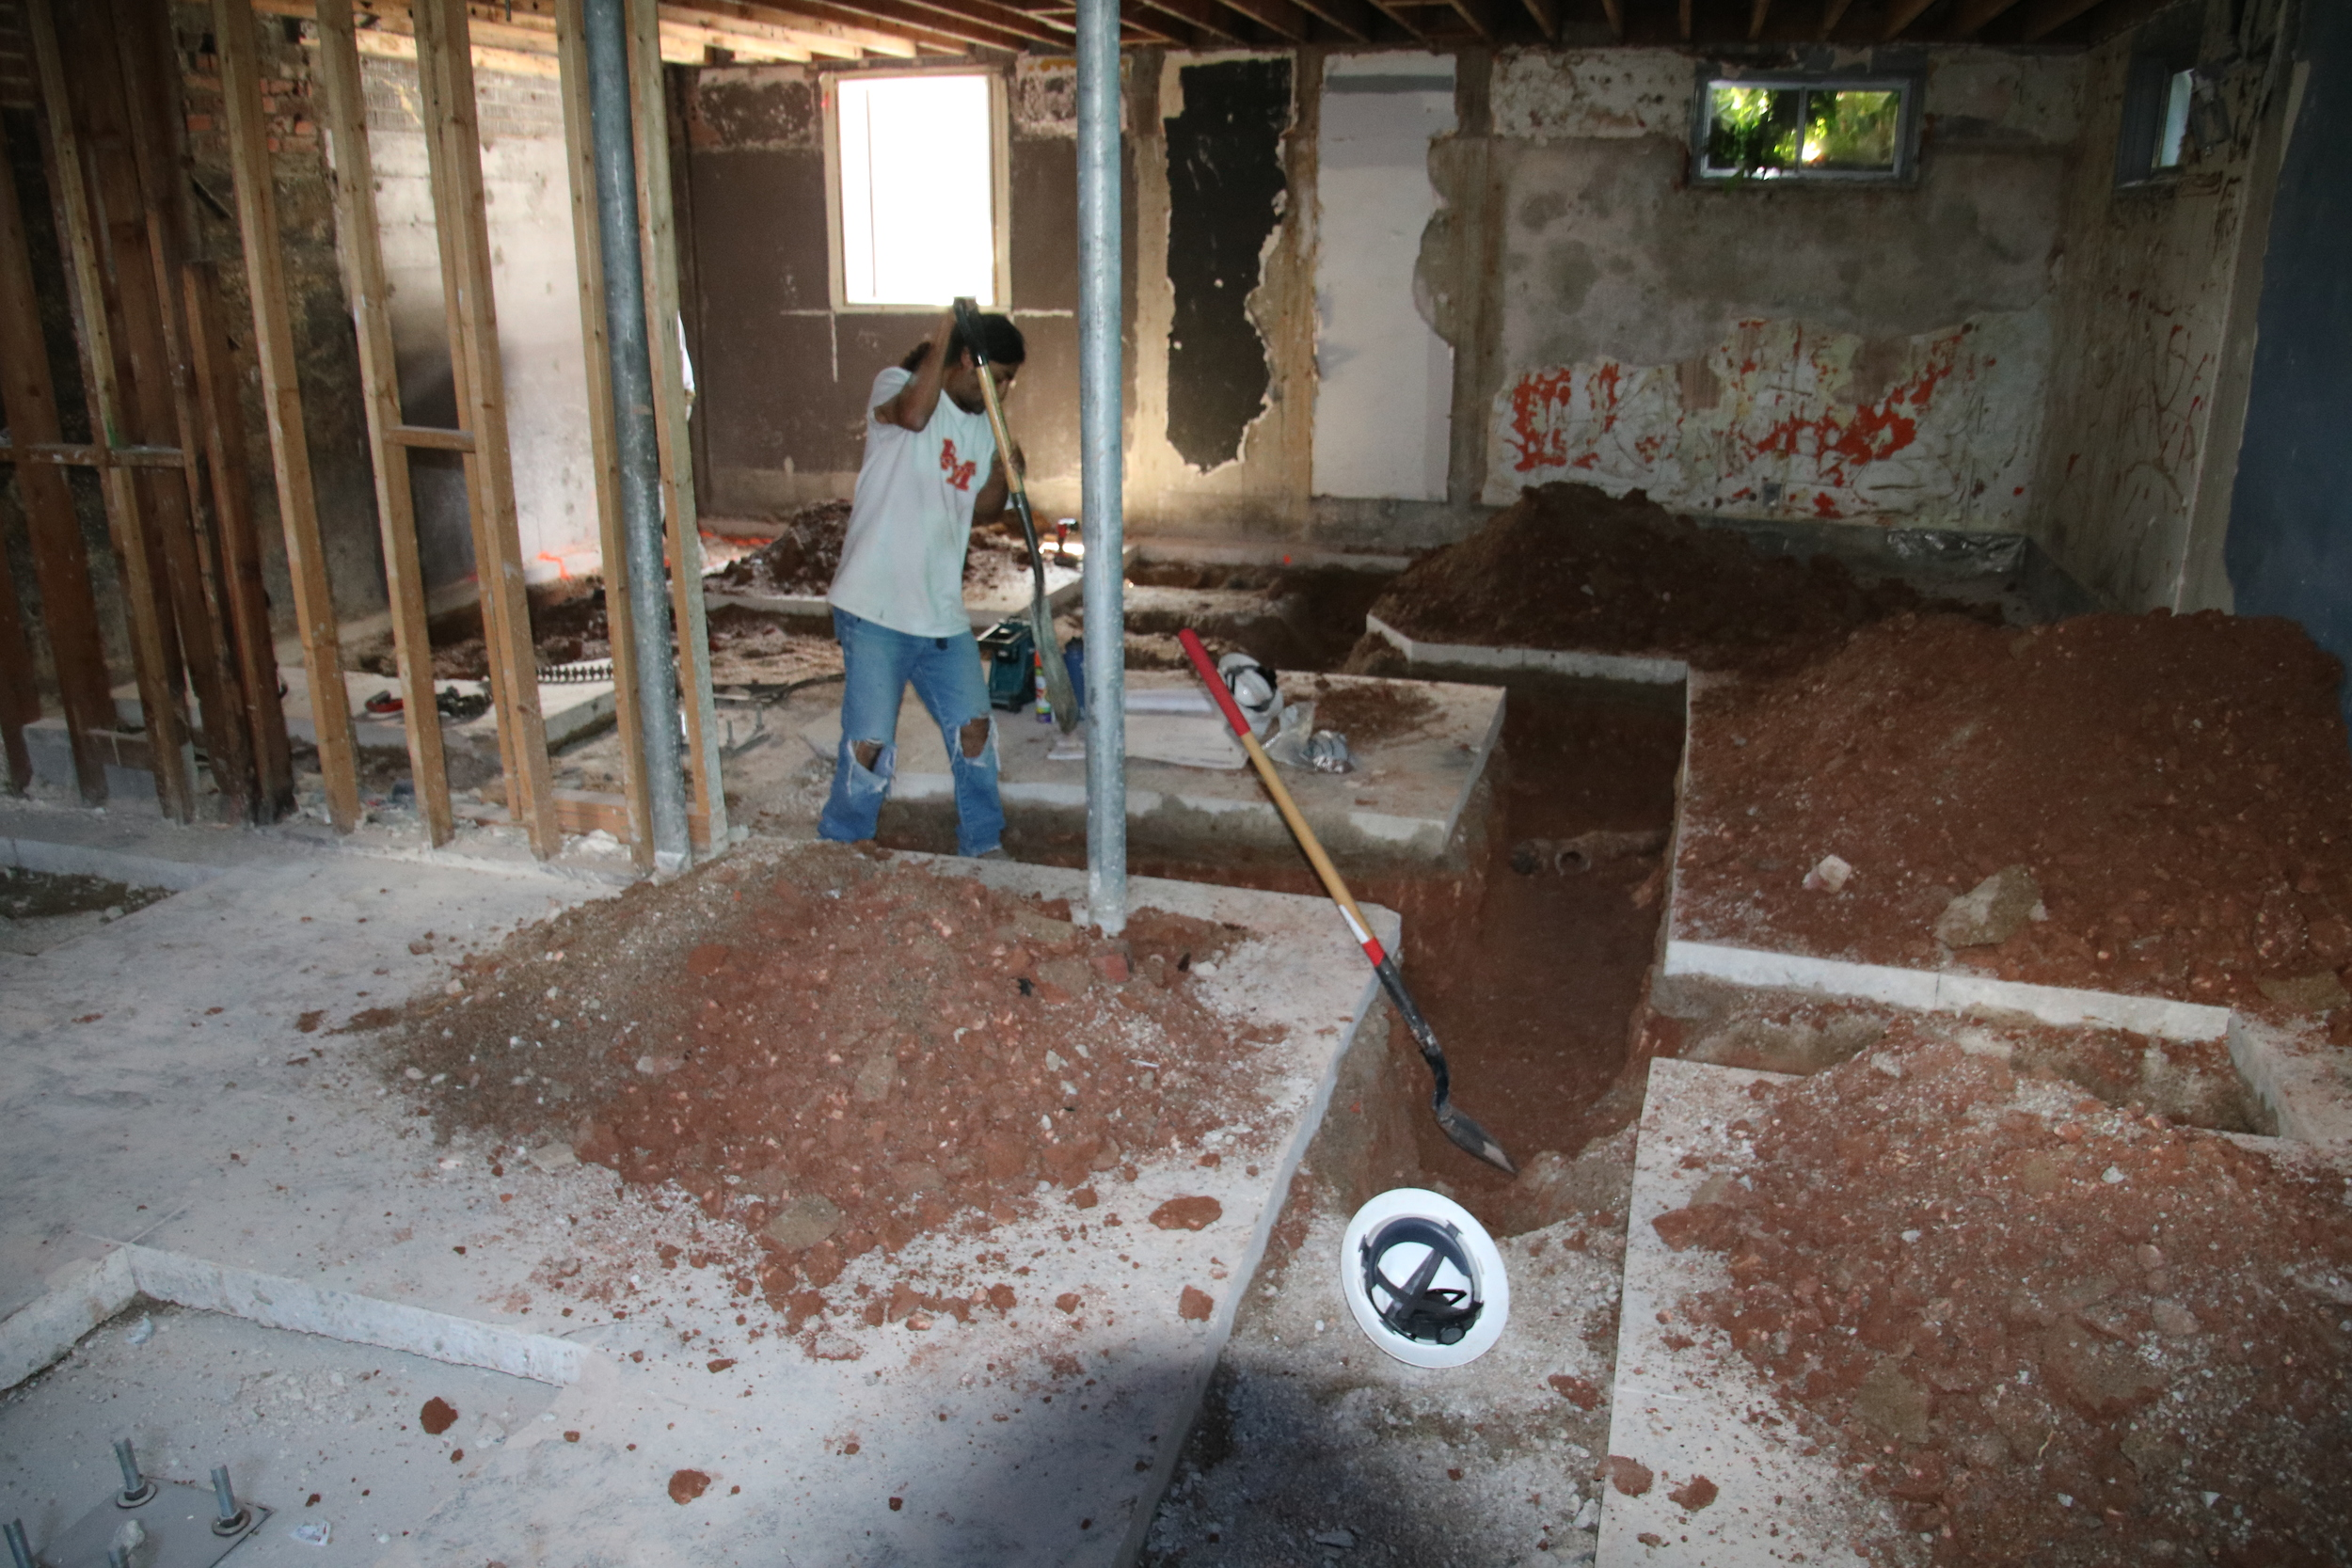 2015-08-03 plumbing trench west basement.JPG